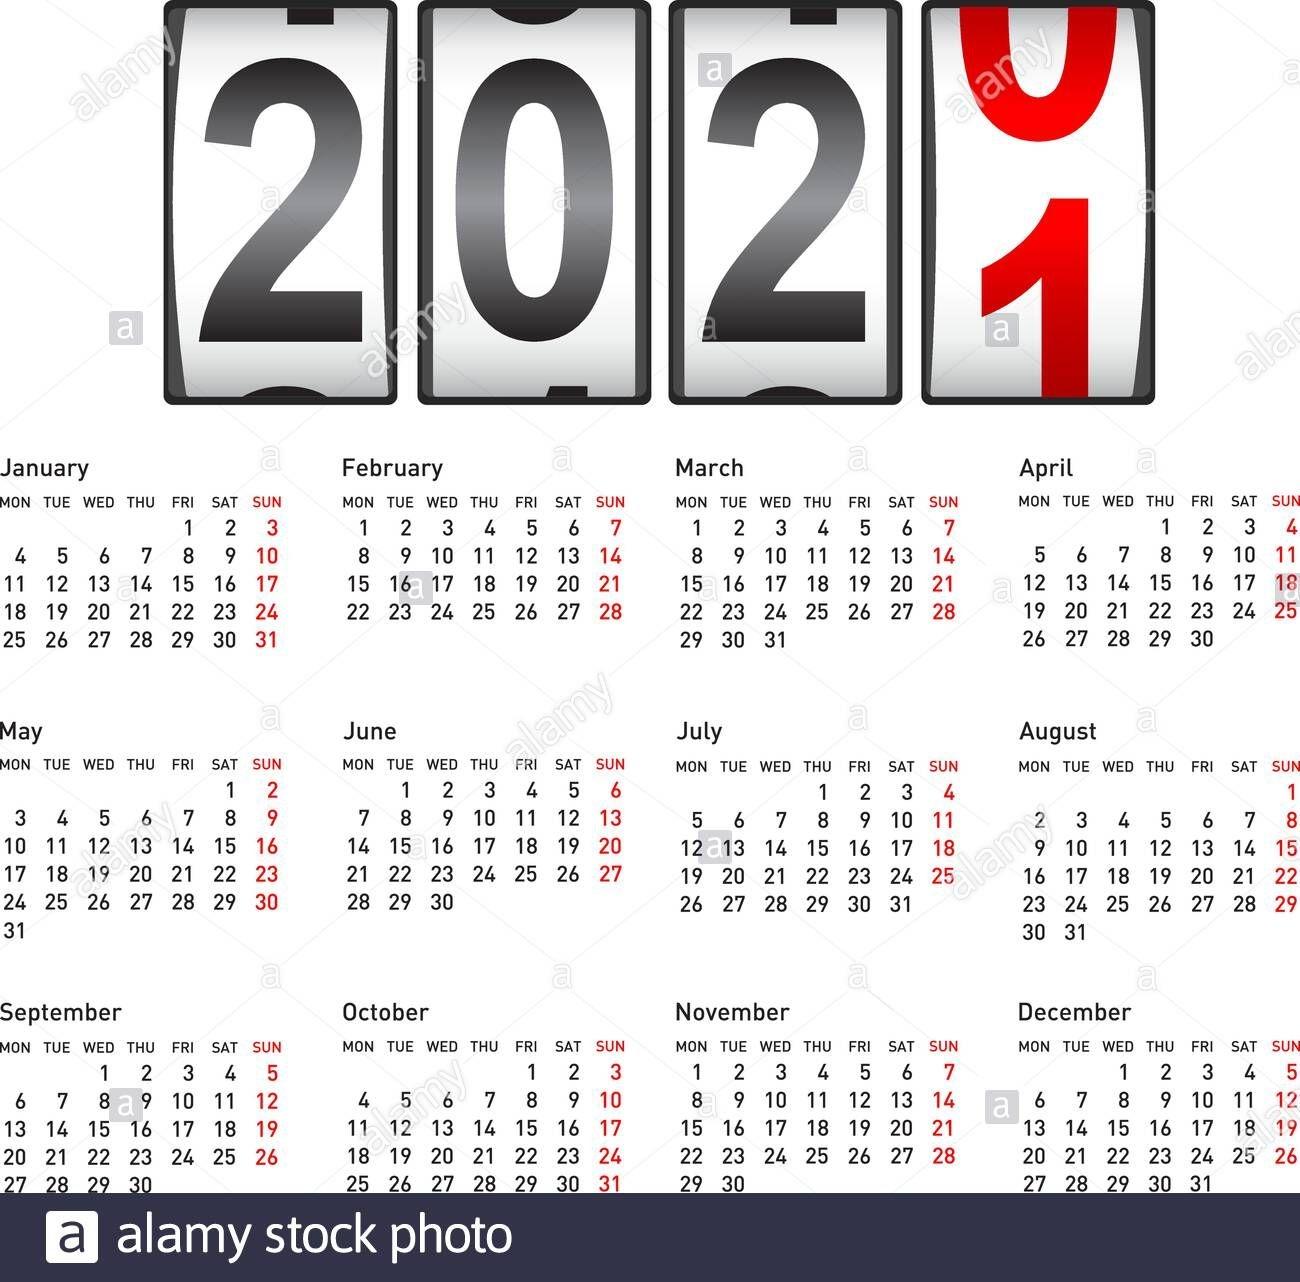 2021 New Year Counter, Change Calendar Illustration Stock